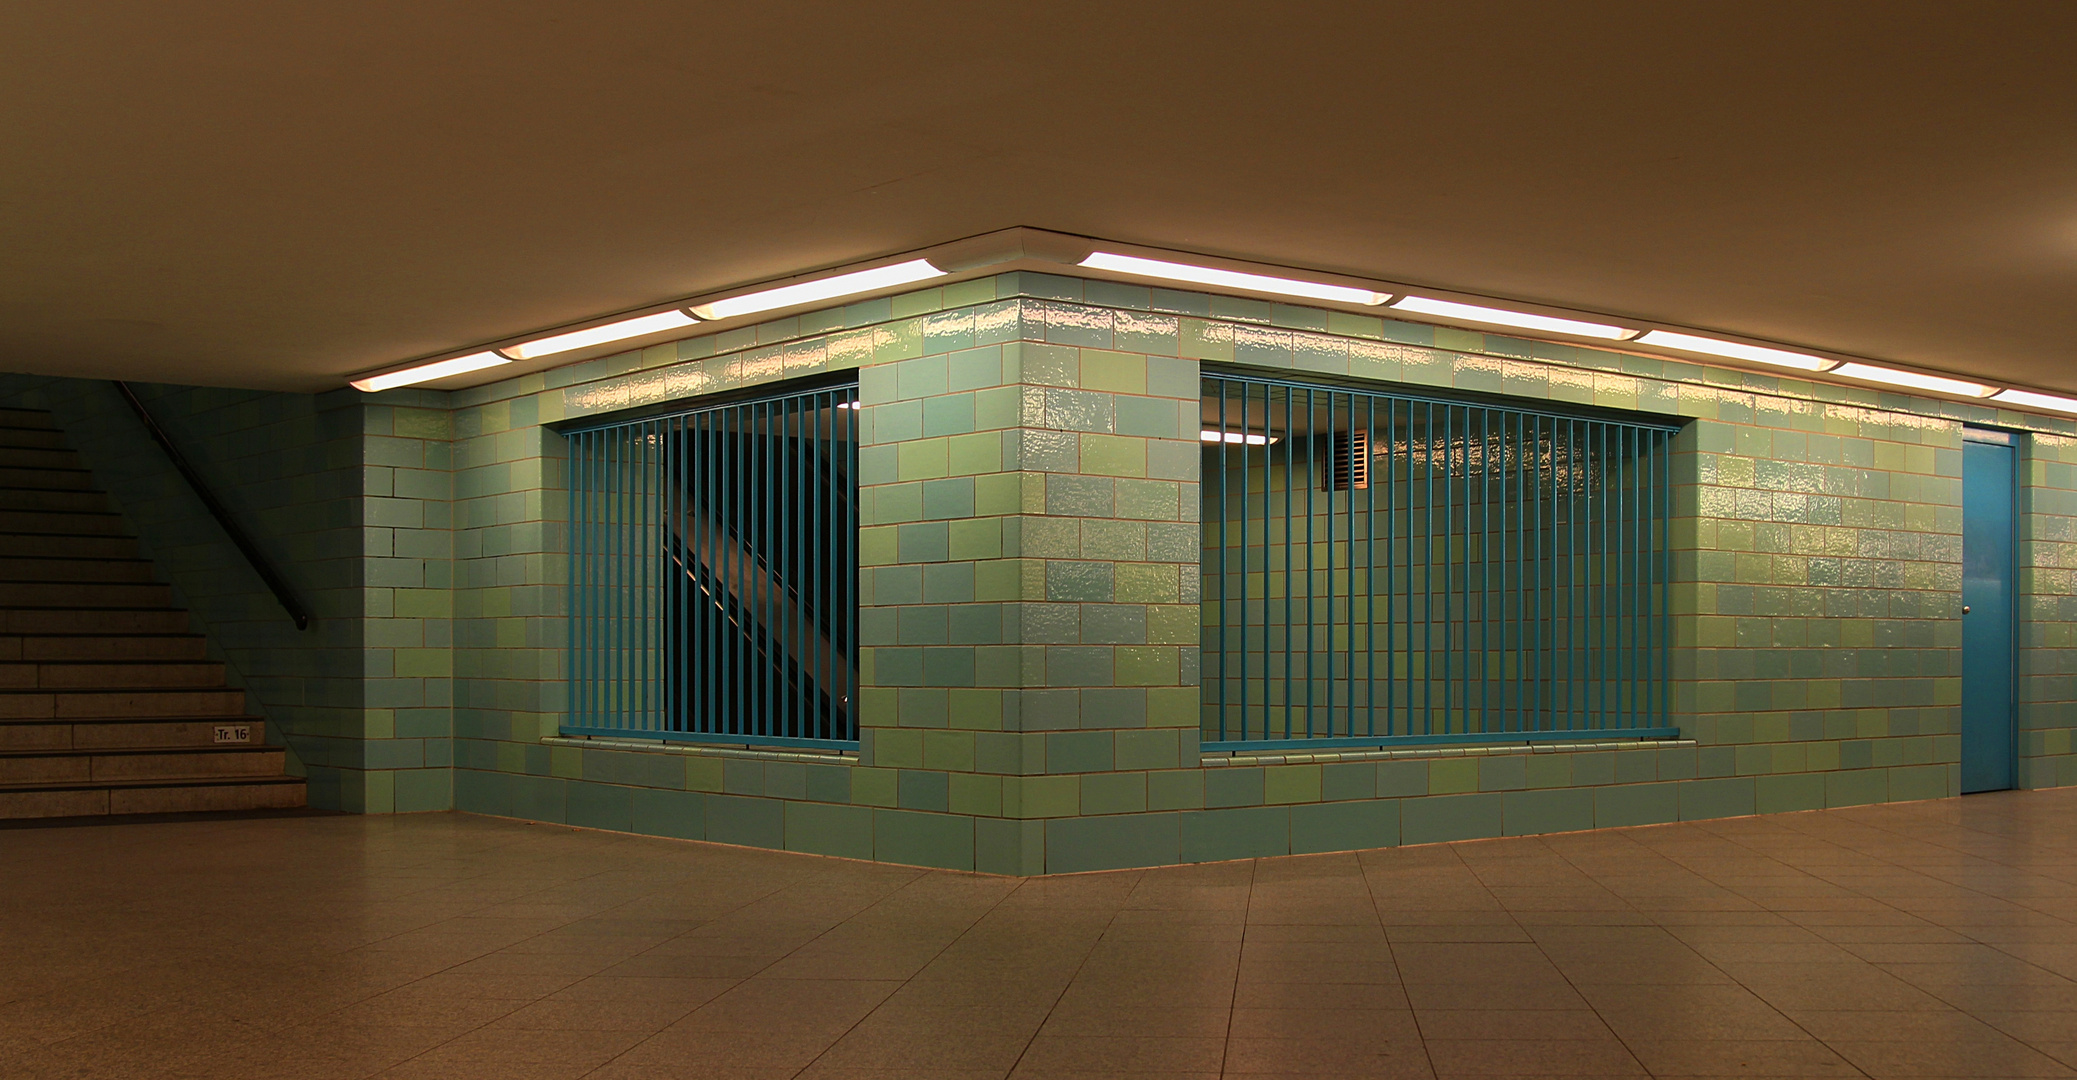 Berlin #6 - U-Bahnhof Alexanderplatz #2